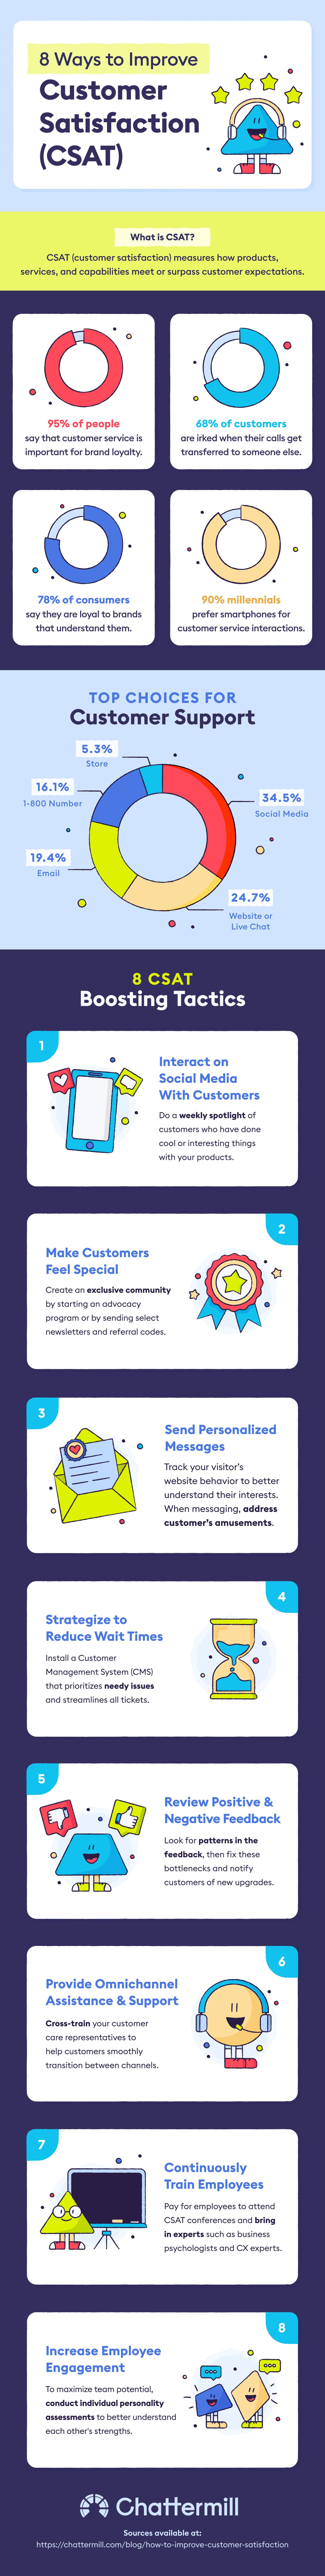 ways-to-improve-customer-satisfaction